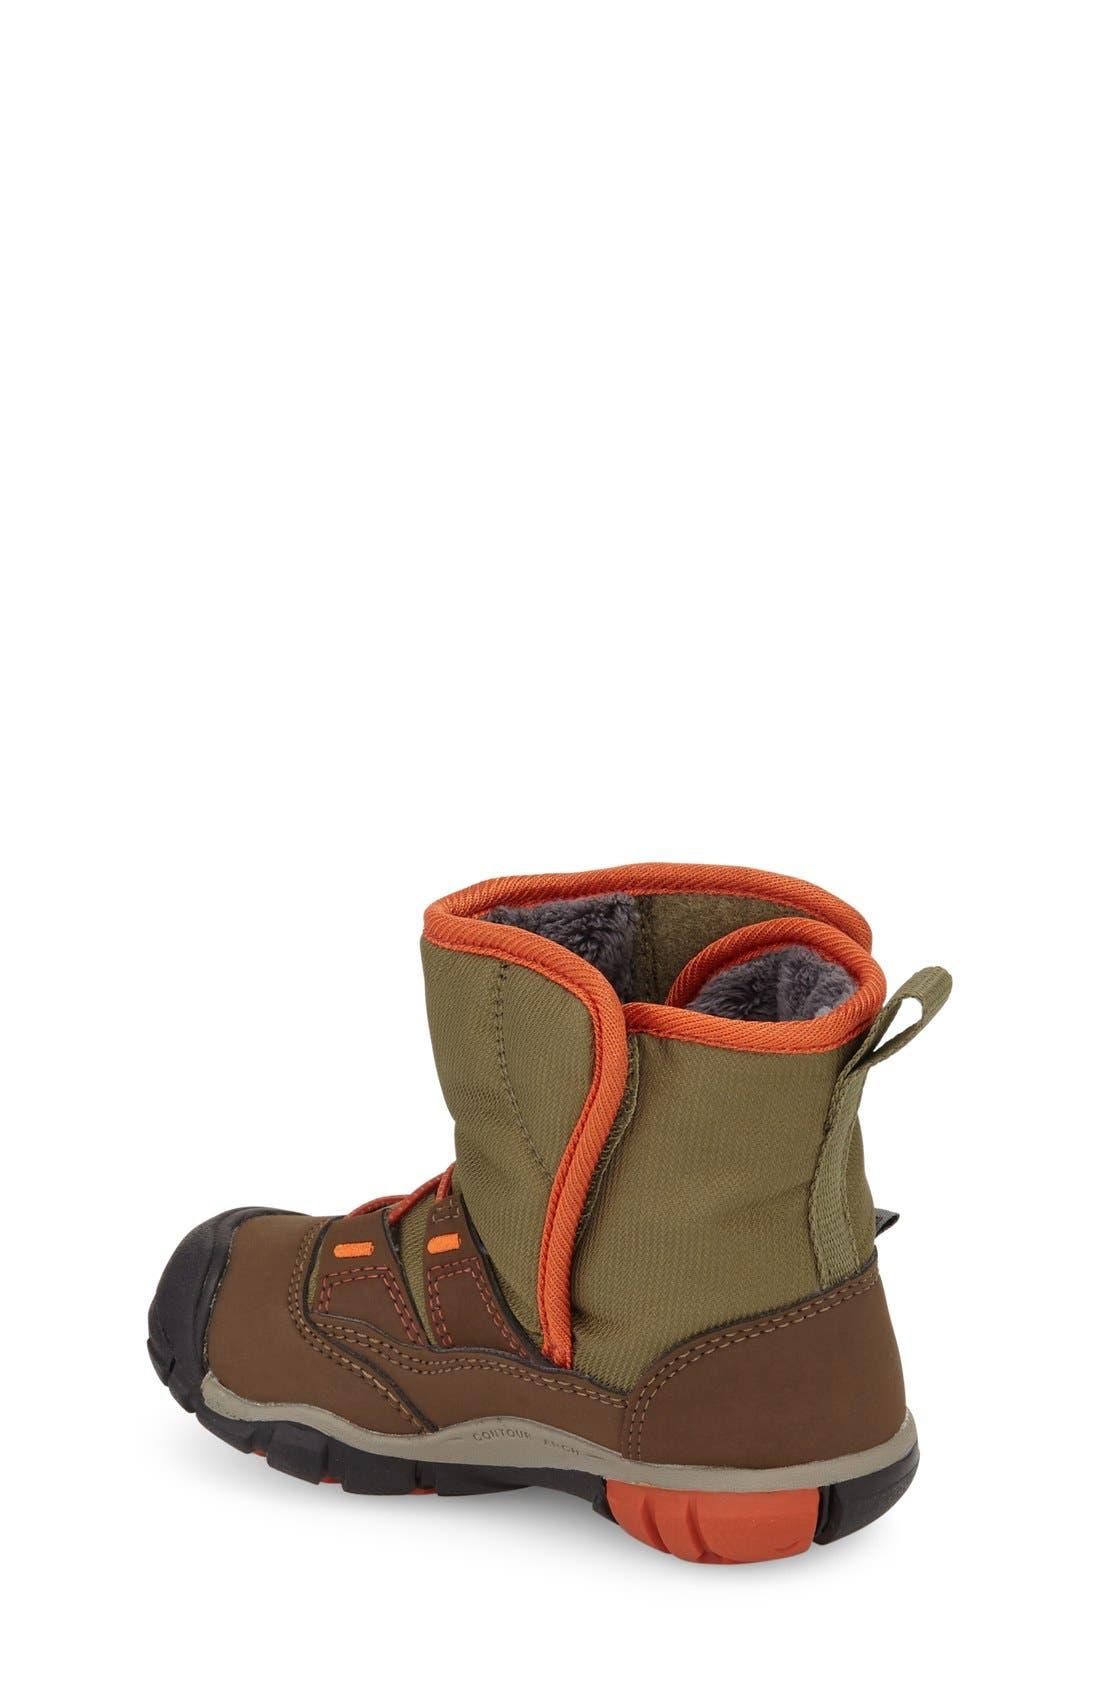 Peek-A-Boot Boot,                             Alternate thumbnail 2, color,                             201